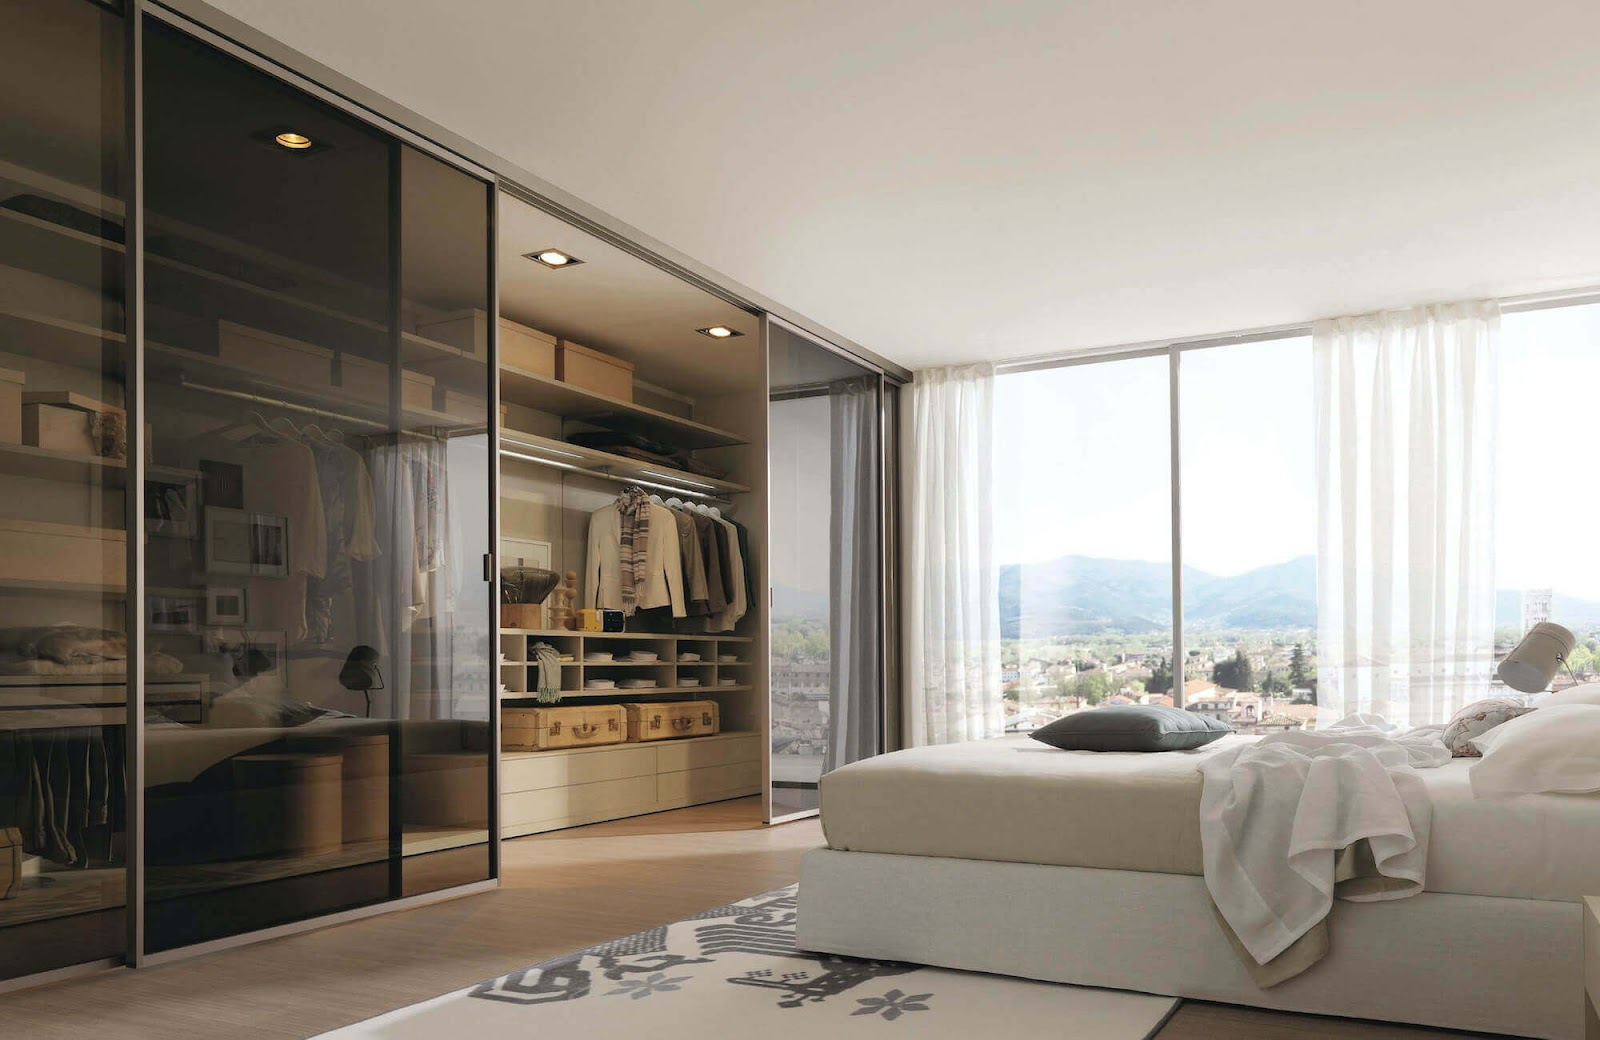 Your Bedroom will feel more Modern with a Mirror Closet Door